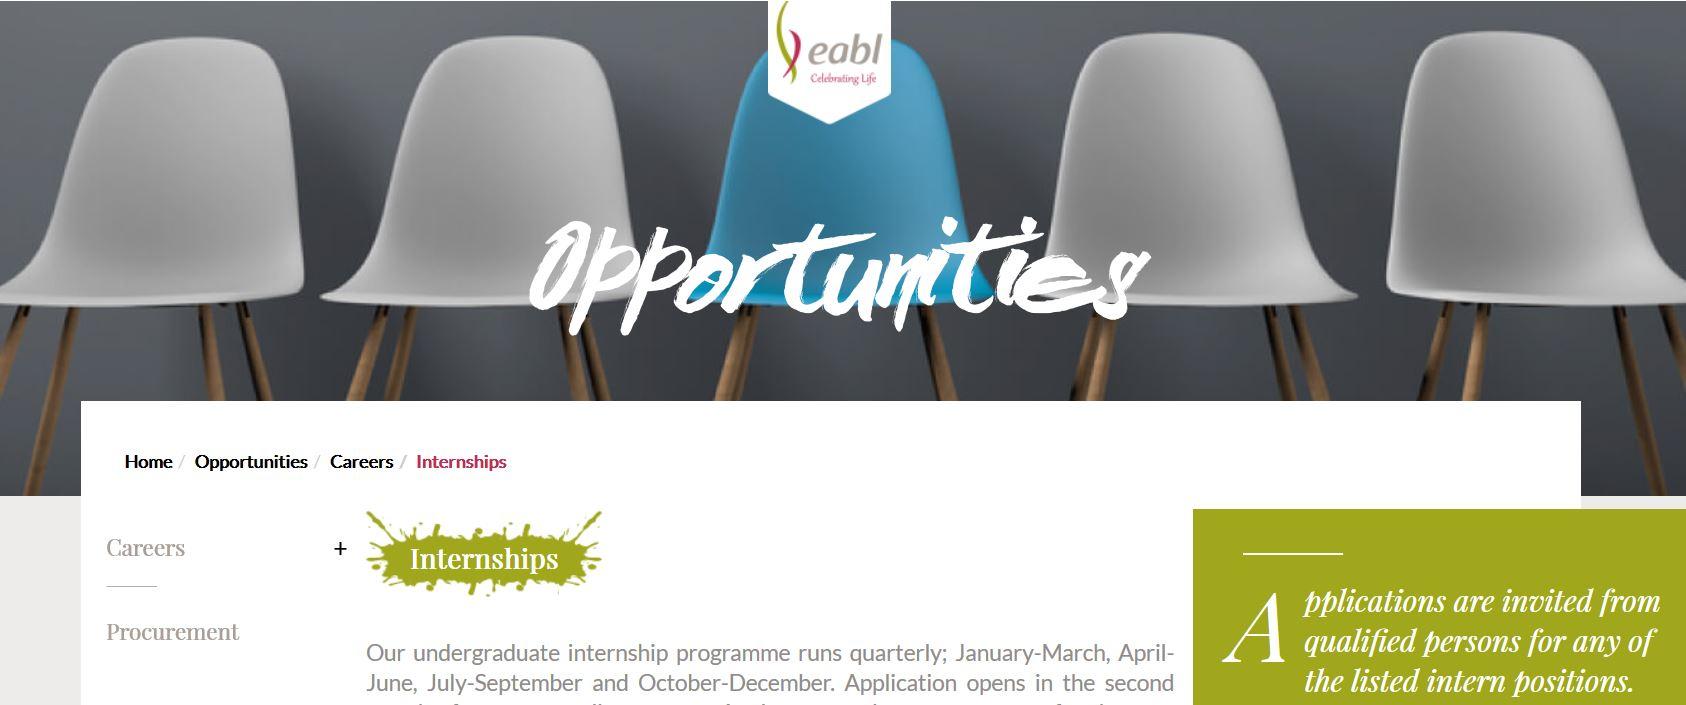 EABL Job, Internship Requirements and sample interview questions pdf